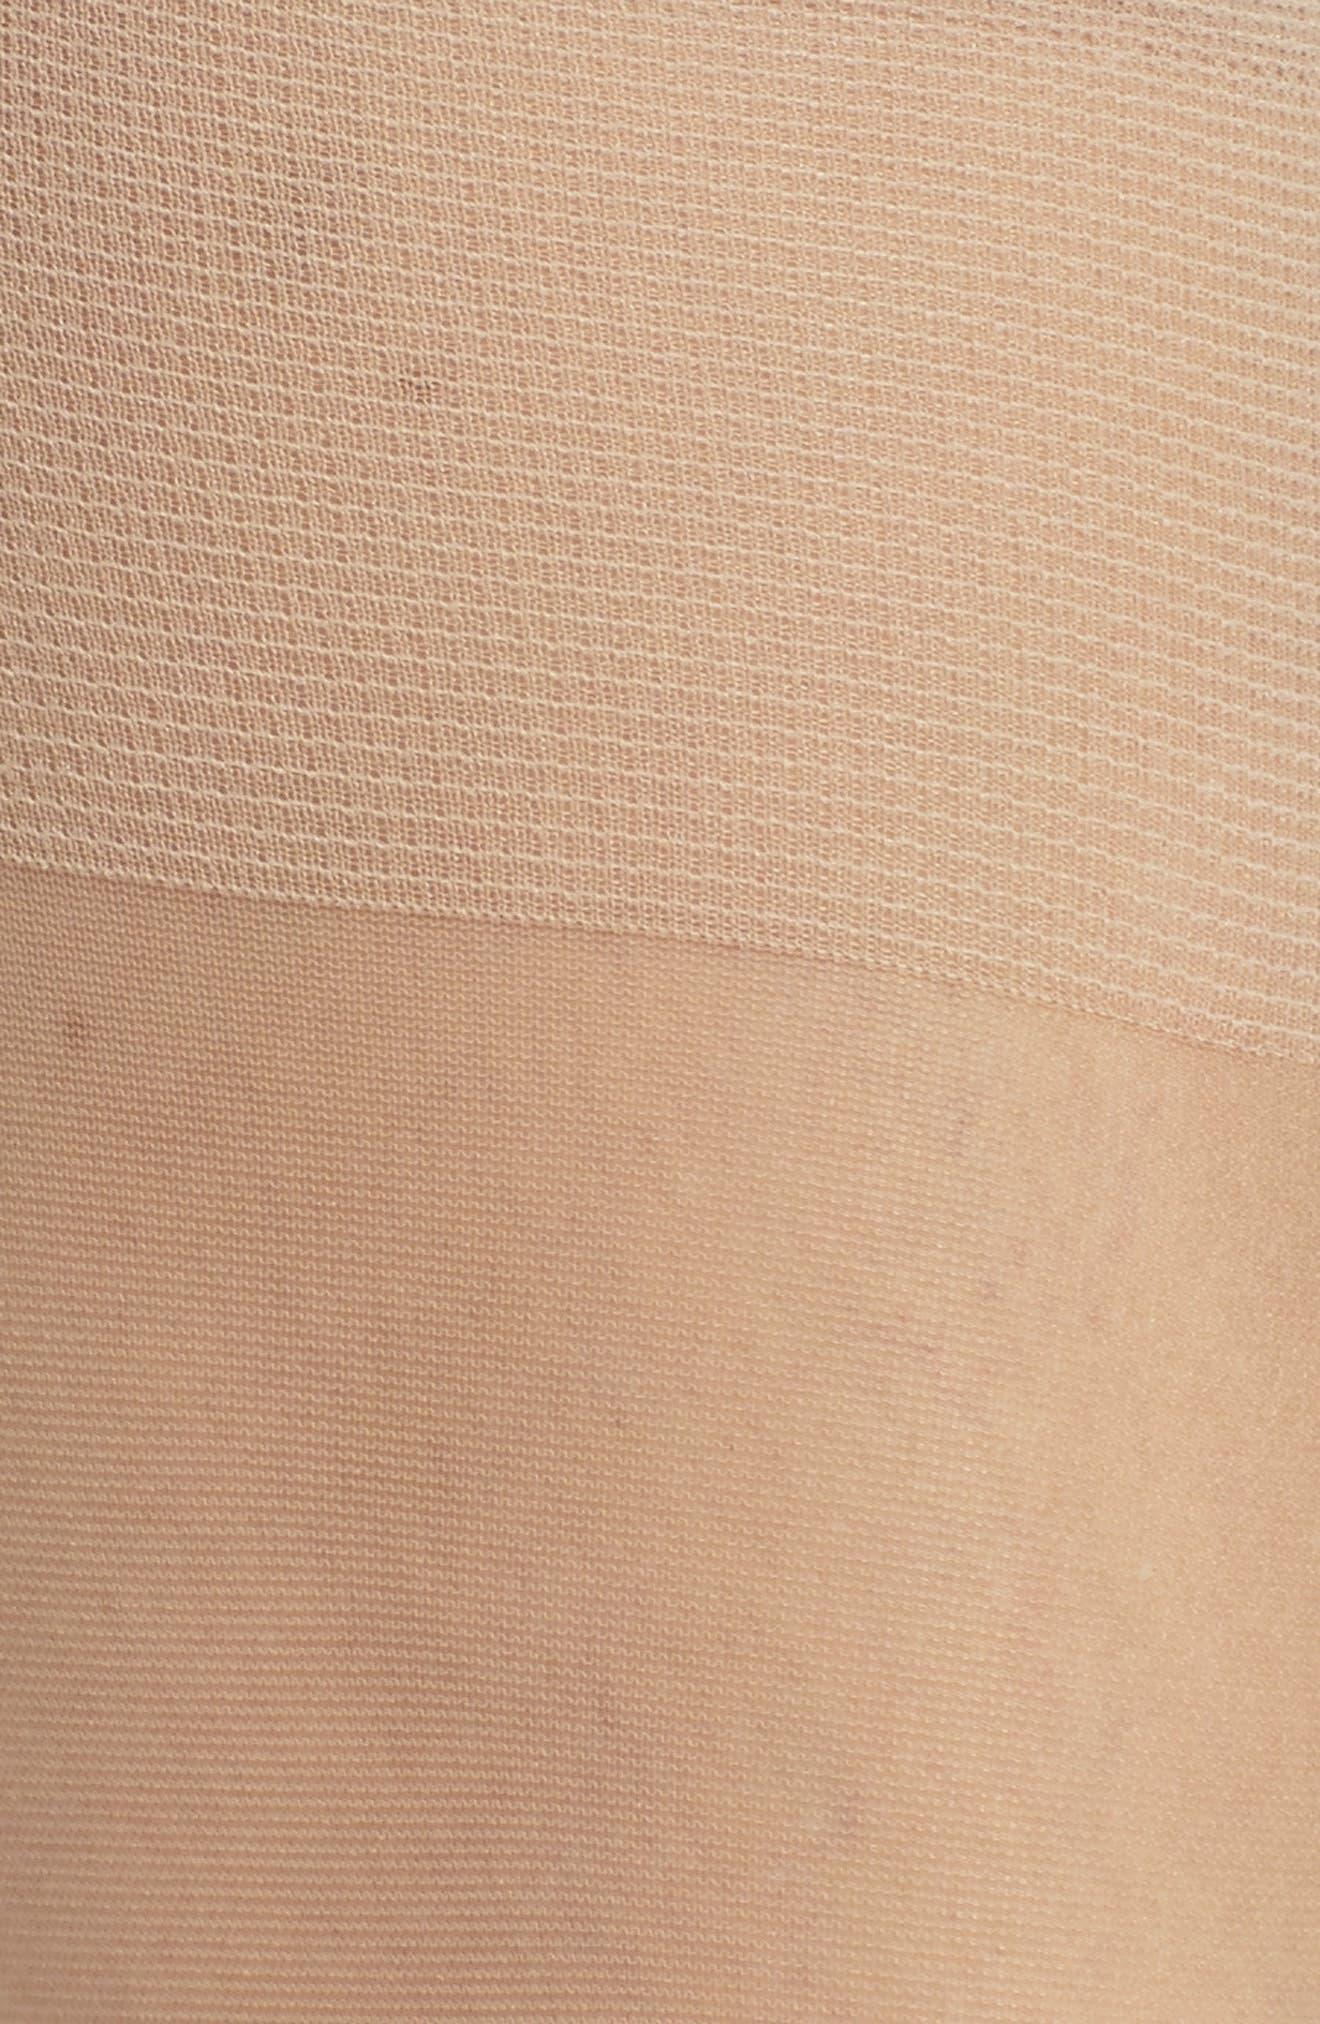 3-Pack Sheer Knee Highs,                             Alternate thumbnail 4, color,                             LIGHT NUDE